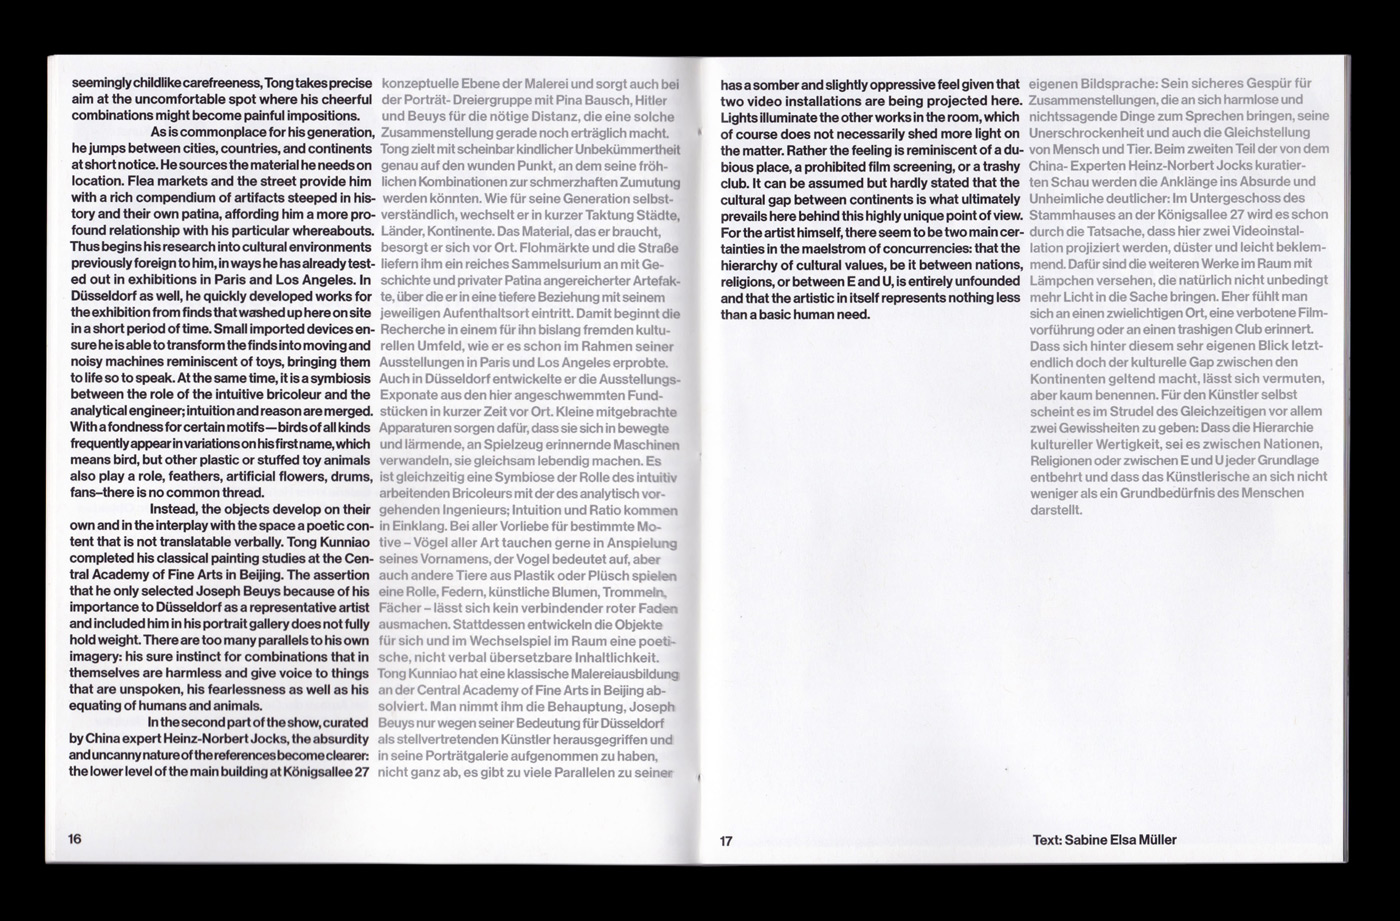 08 collide24 David Rindlisbacher Maximilian Mauracher - Maximilian Mauracher and David Rindlisbacher on their methodical and precise collaborative practice